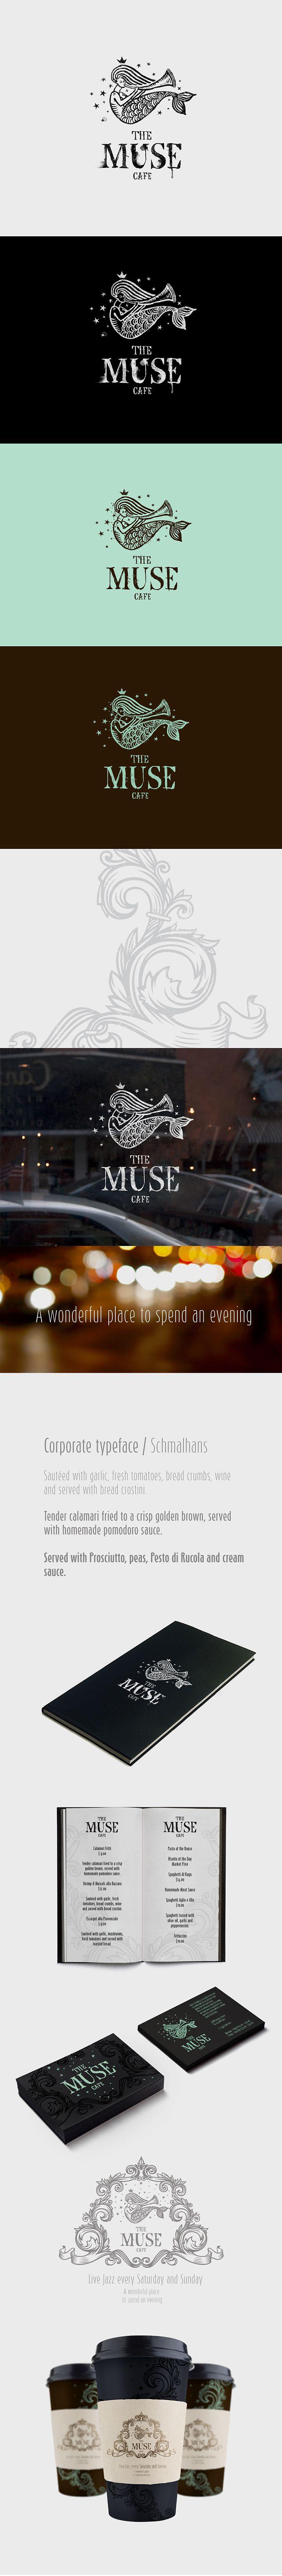 ru_identity: The Muse cafe / Фирменный стиль, логотип. lovely logo #identity #packaging #branding PD